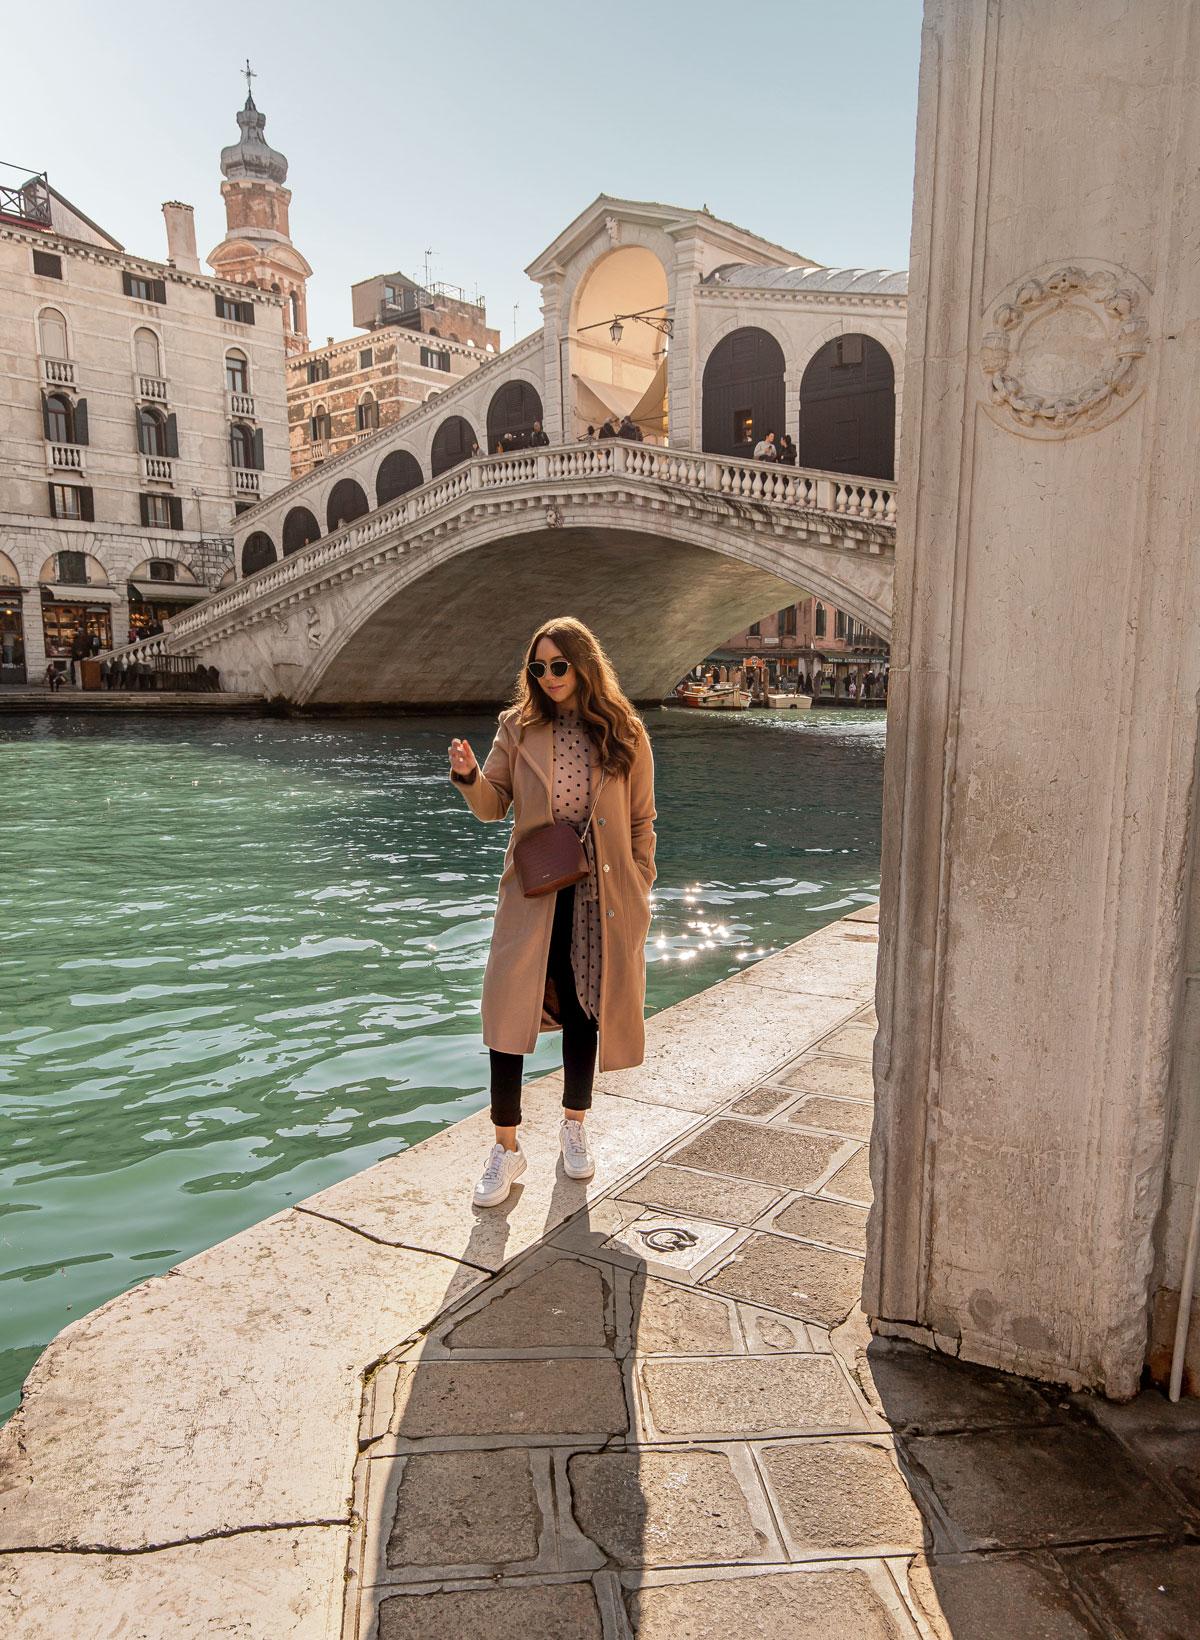 31-top-things-to-do-in-Venice---Venice-Instagram-spots-–-Venice-bucket-list---kelseyinlondon---kelsey-heinrichs---venice-gondola-ride---venice-grand-canal